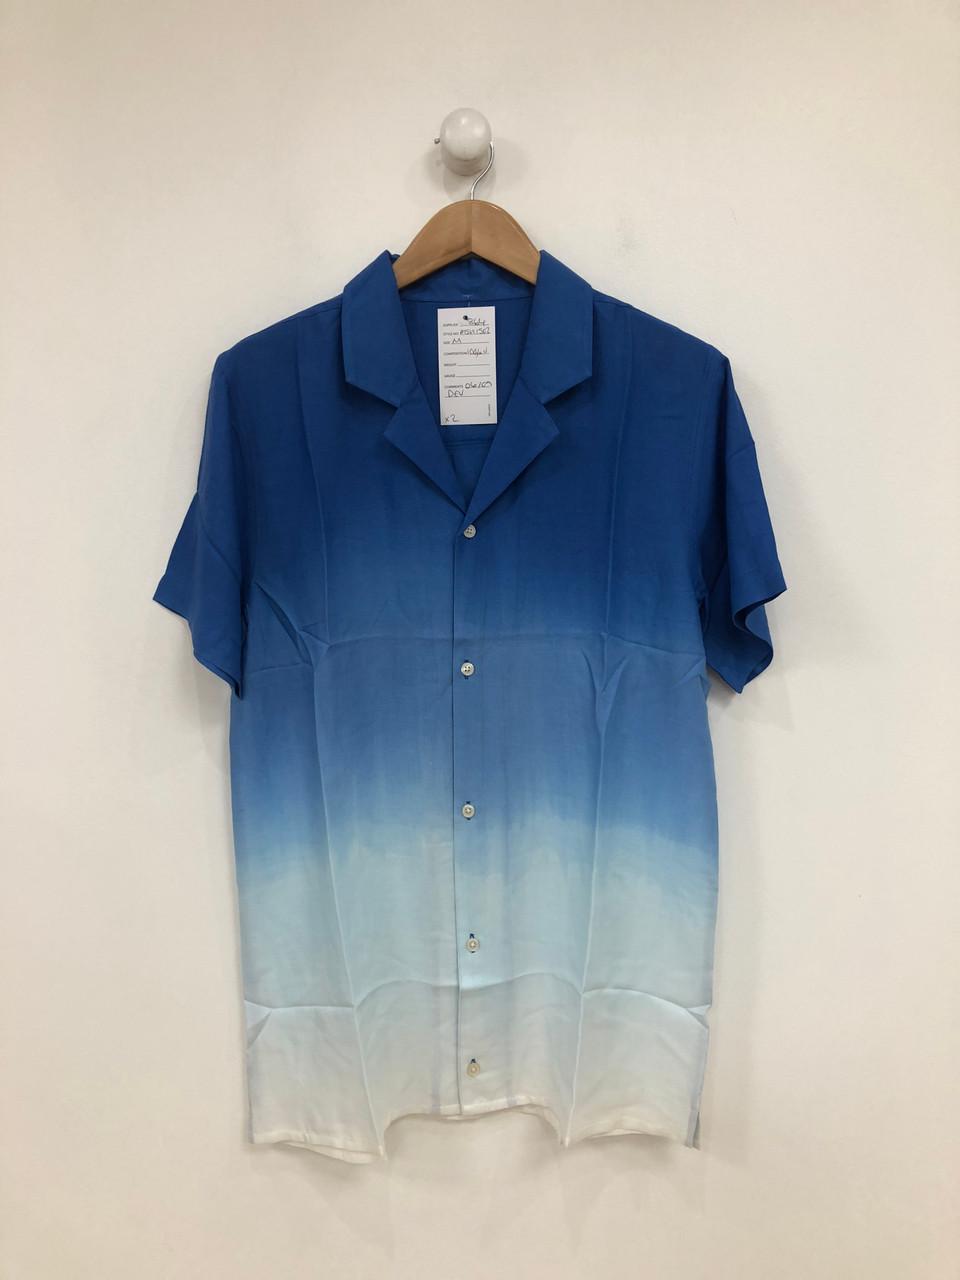 Dip Dye Short Sleeve Revere Collar Shirt